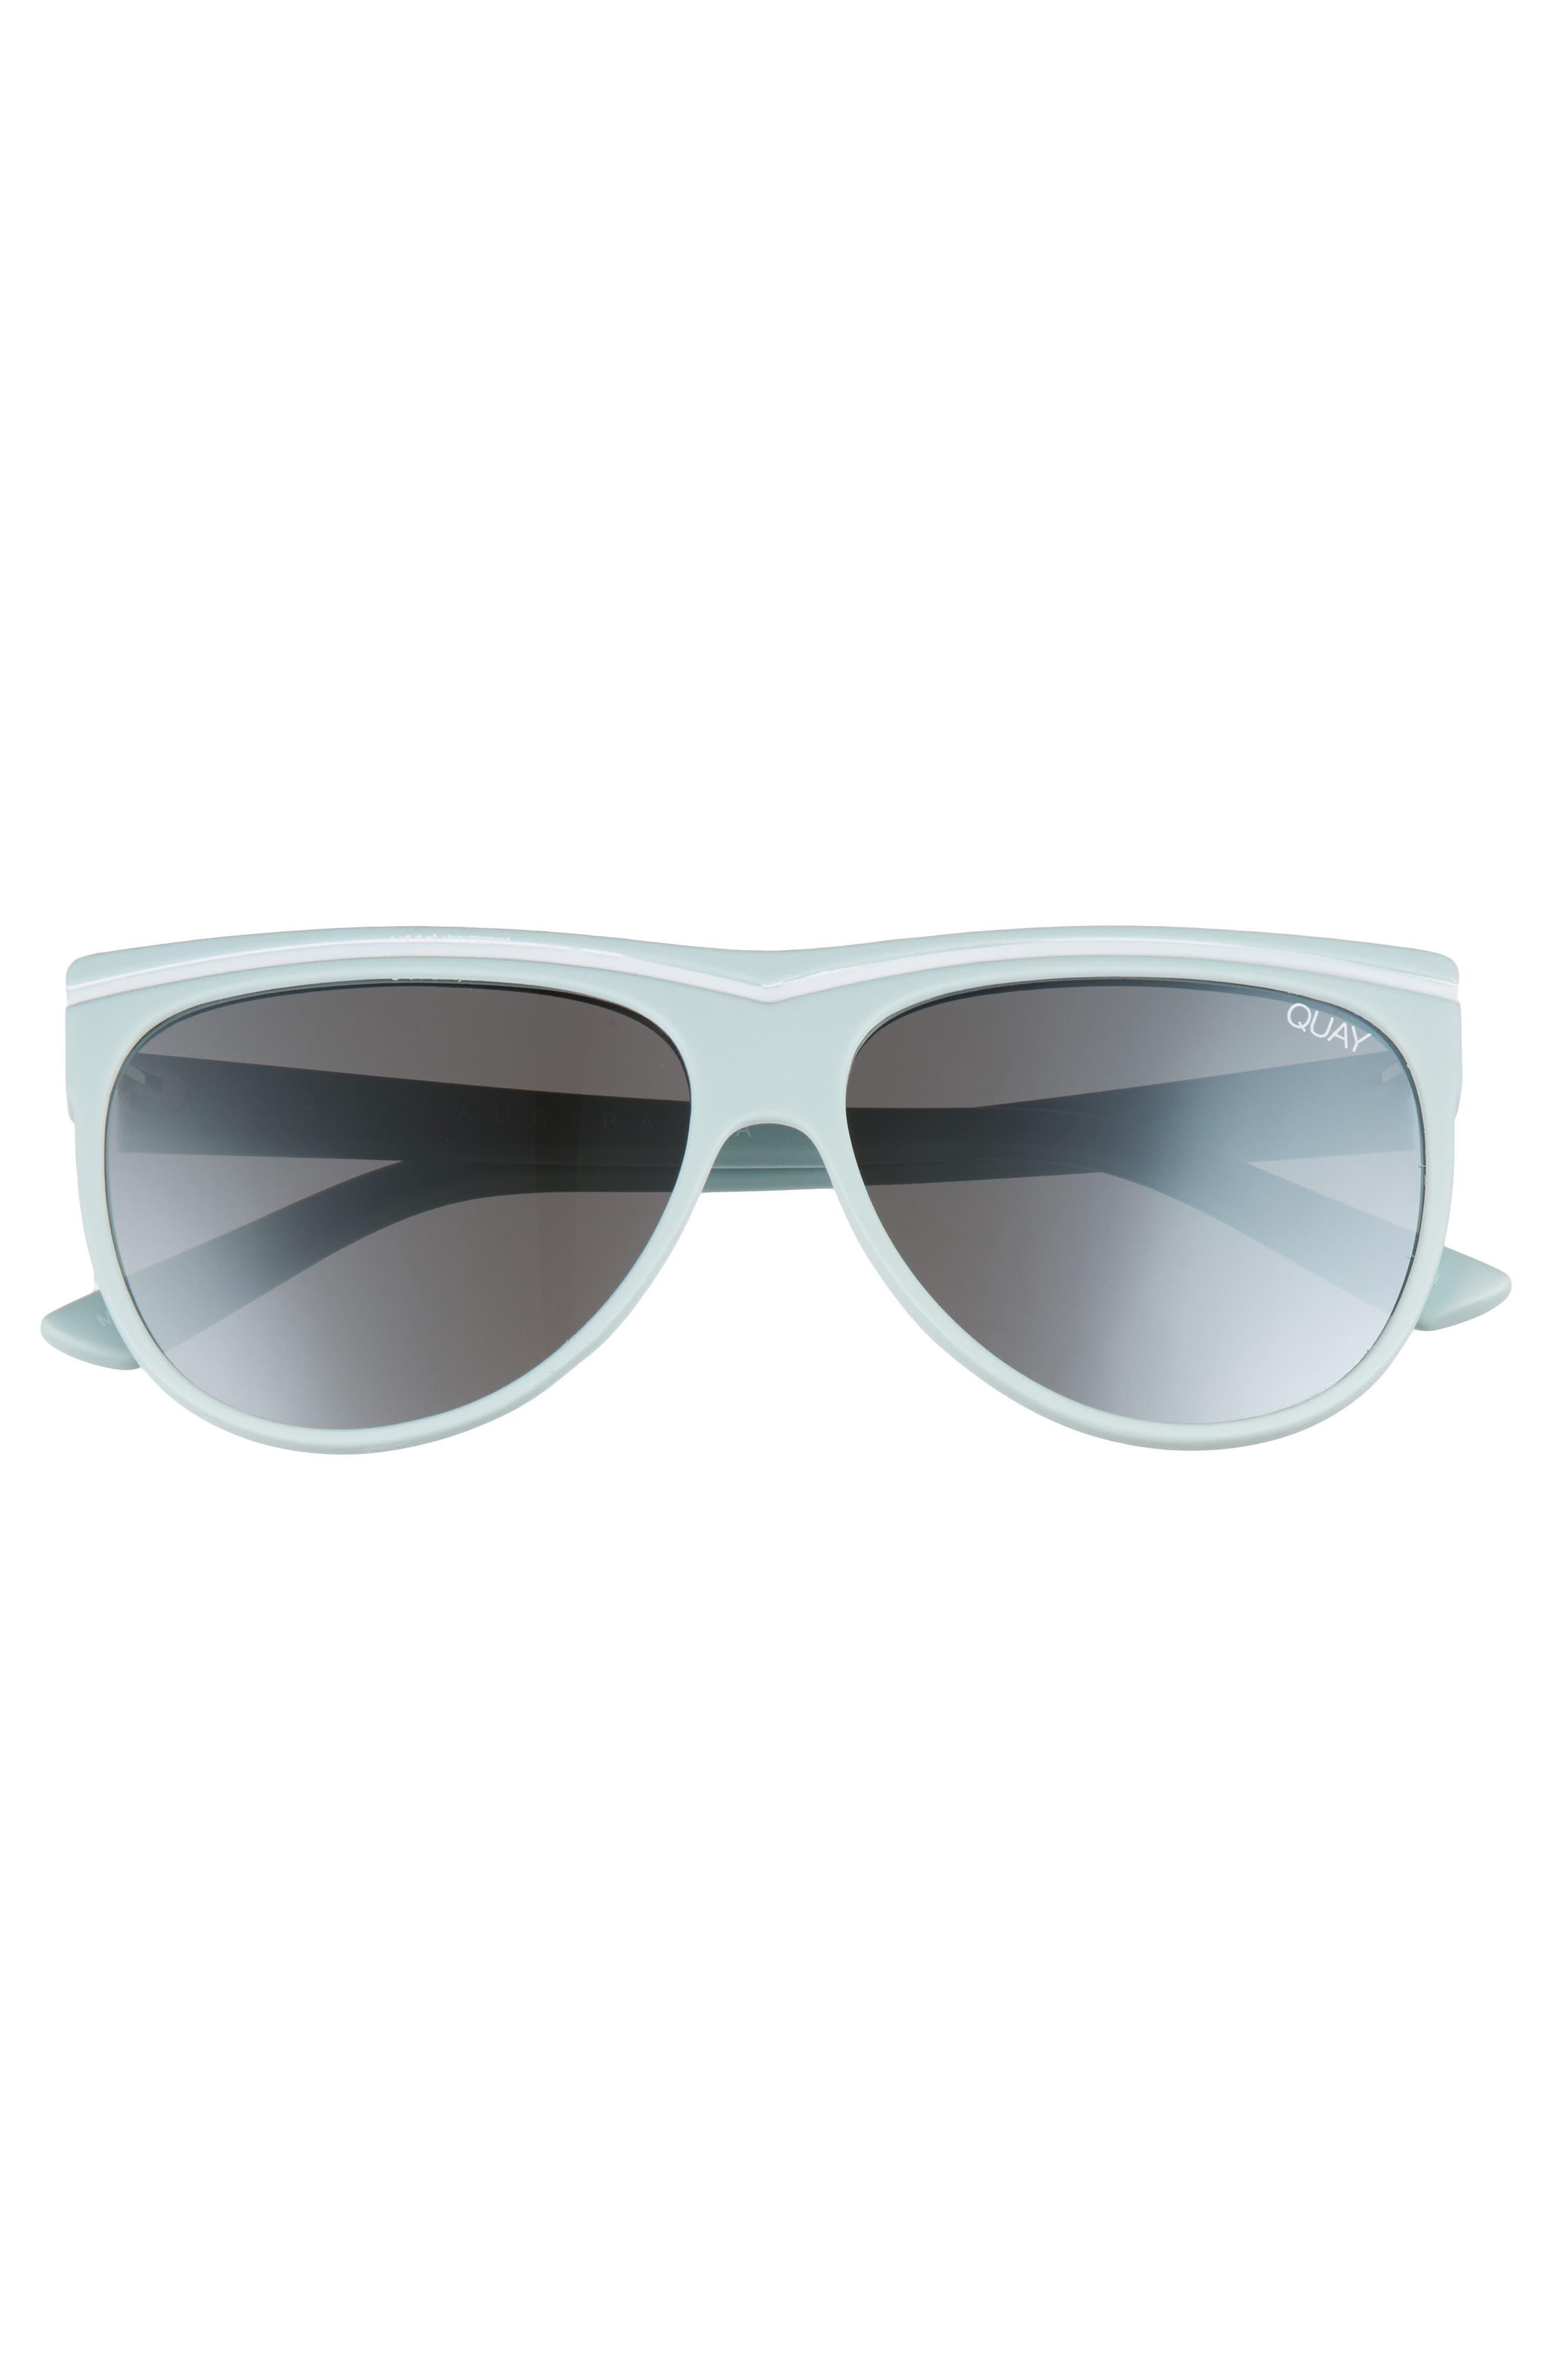 Hollywood Nights 62mm Sunglasses,                             Alternate thumbnail 8, color,